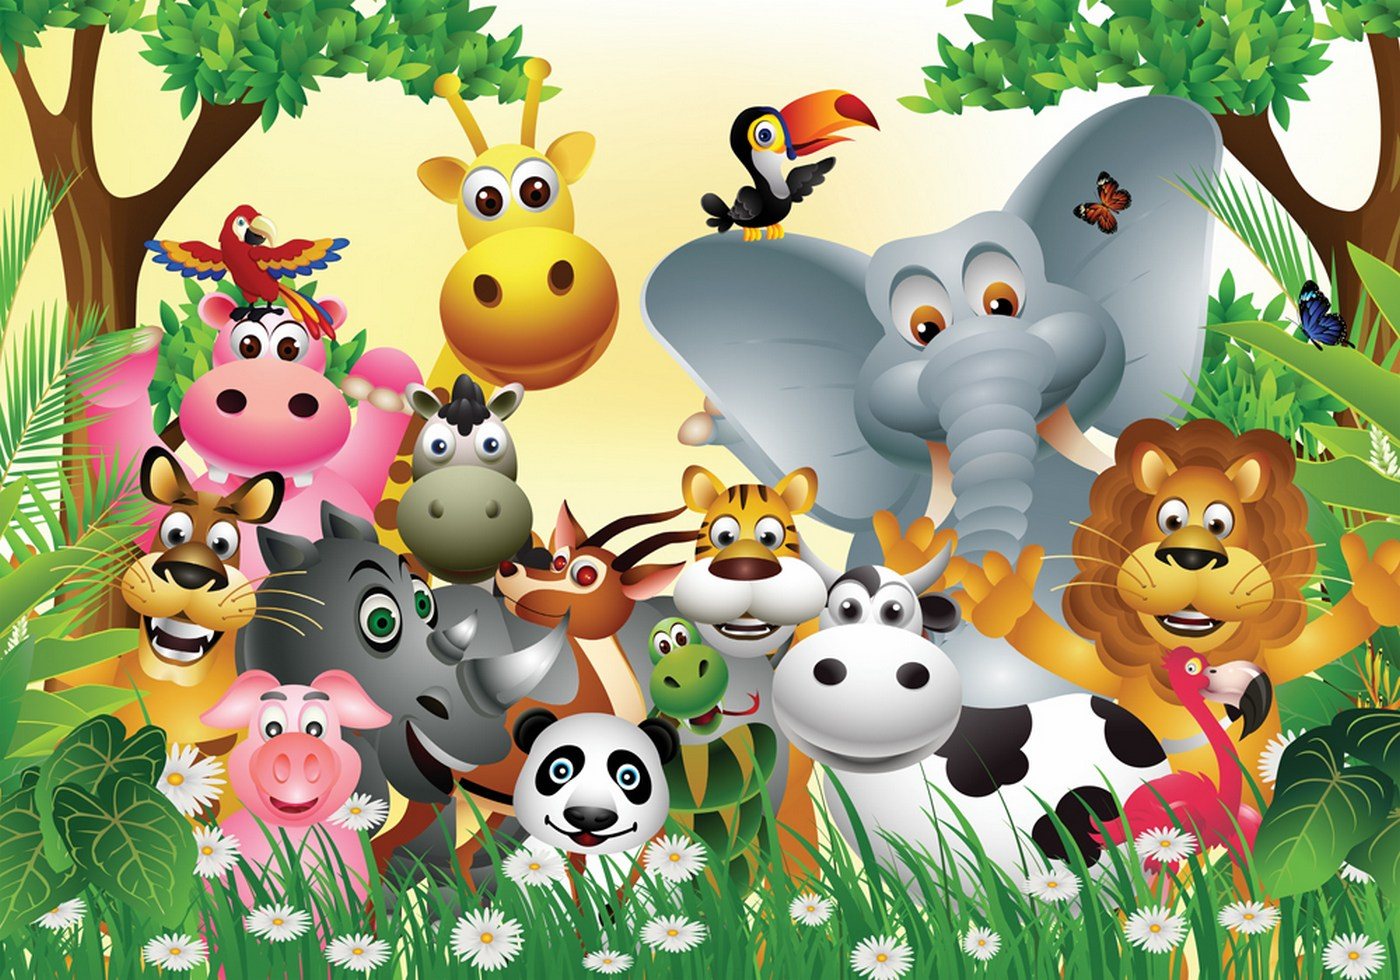 Kiss Fototapeten Zu Besten Preisen Fototapete Jungle Animals